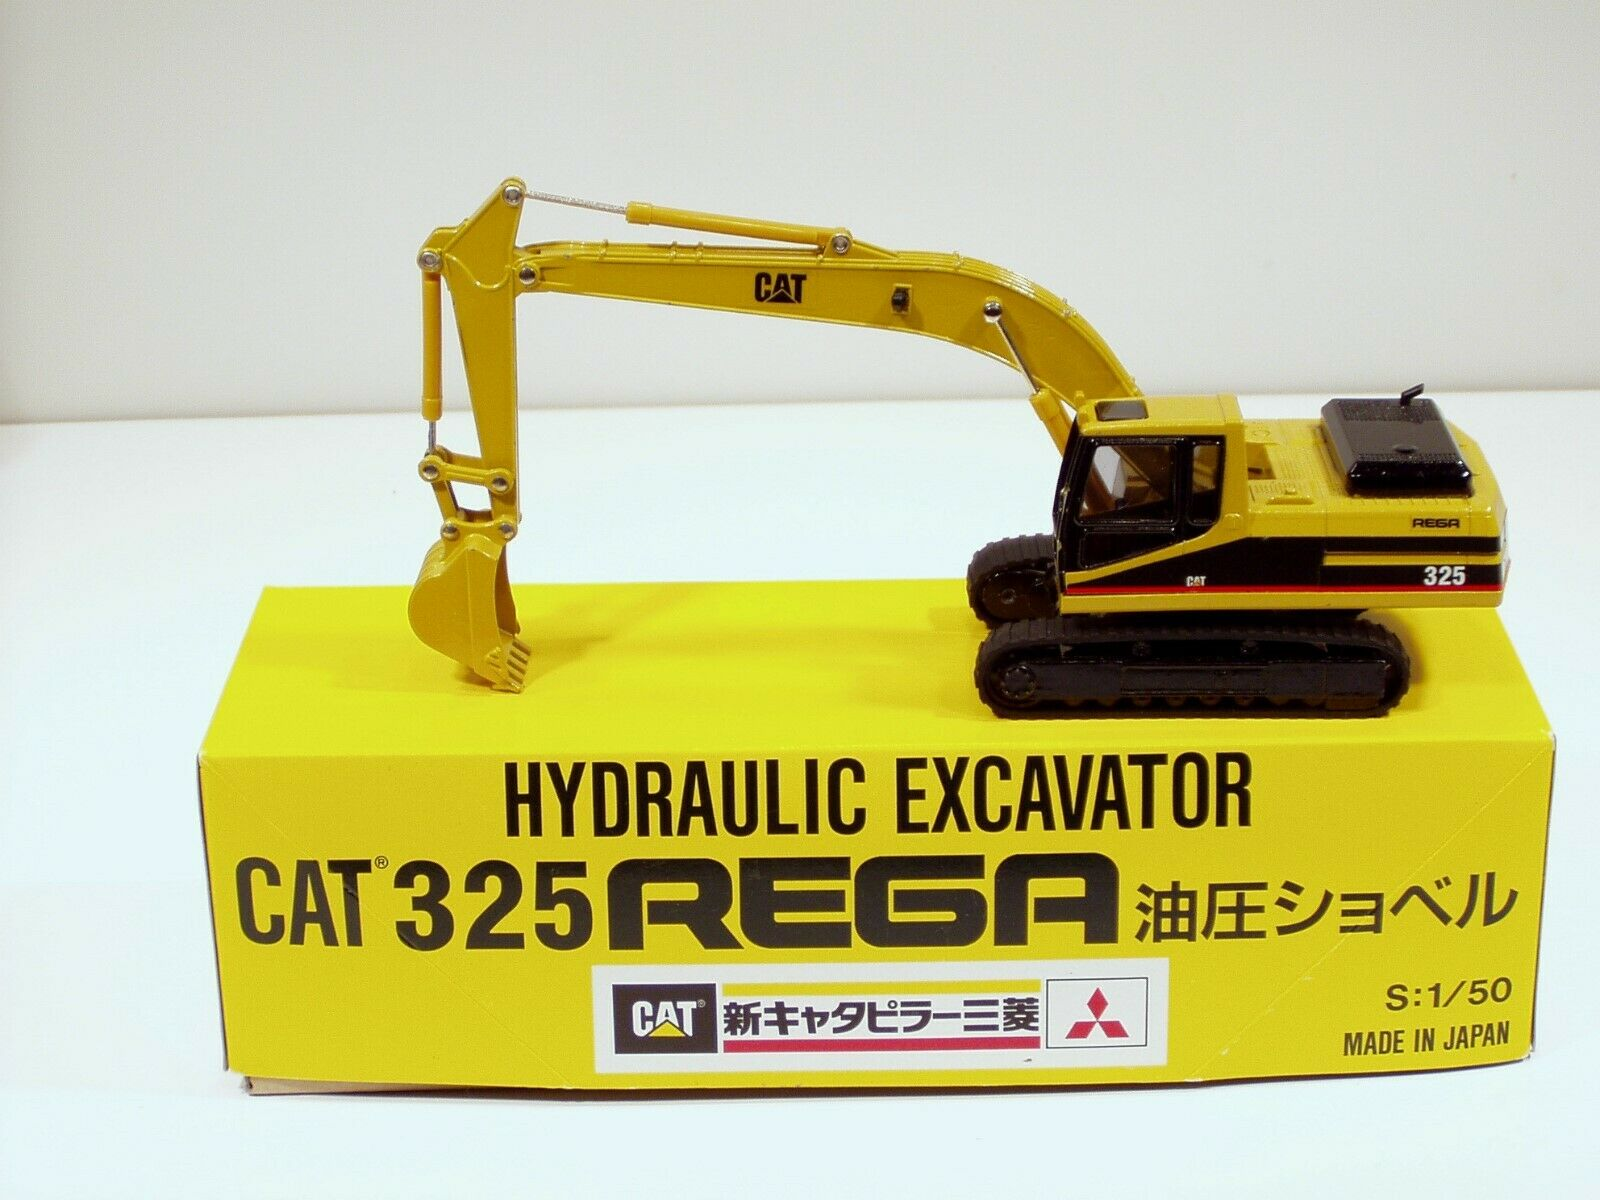 Caterpillar 325  rega Excavateur - 1 50 - Shinsei  606 - Comme neuf IN BOX  pas cher en ligne